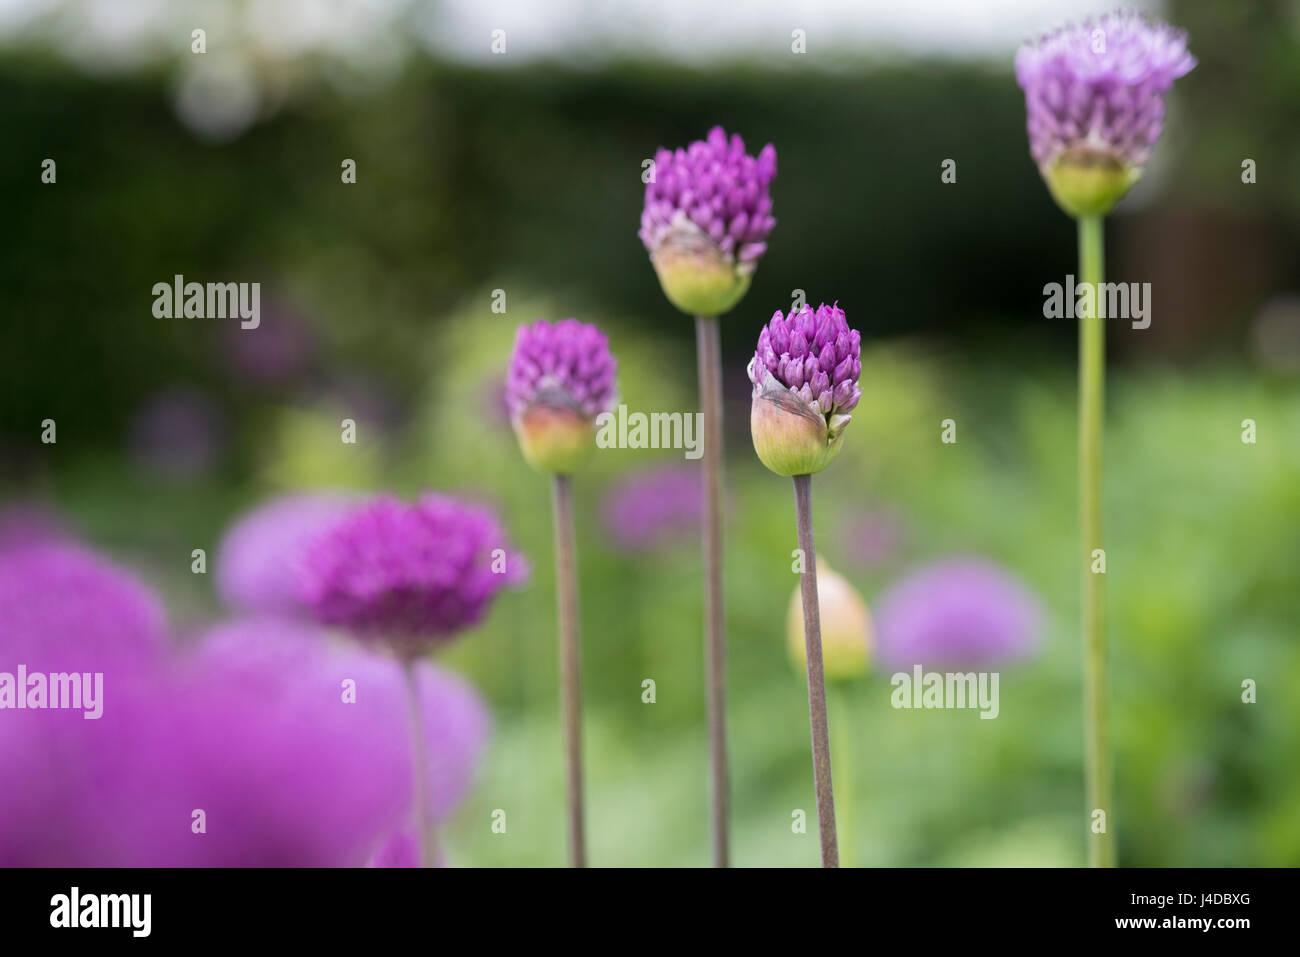 Allium purple sensation flowers opening in an English garden - Stock Image